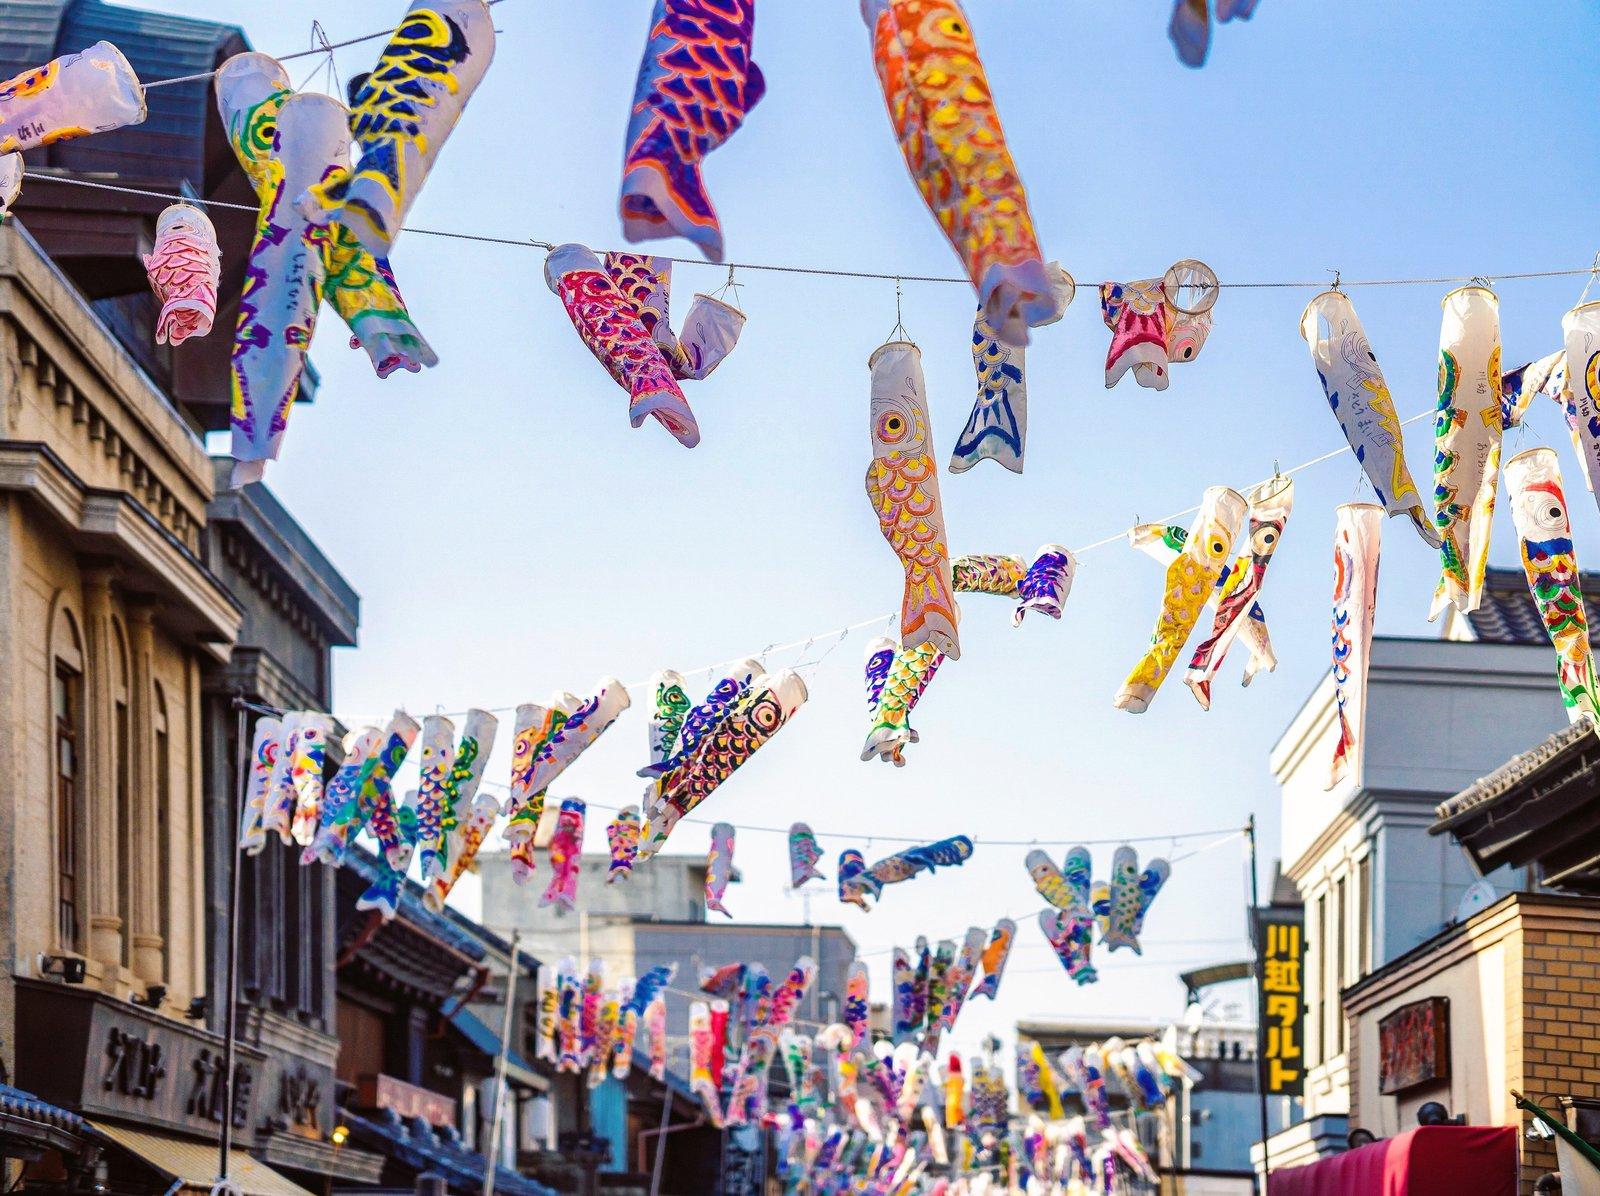 koinobori in the street on children's day in japan 2020 golden week